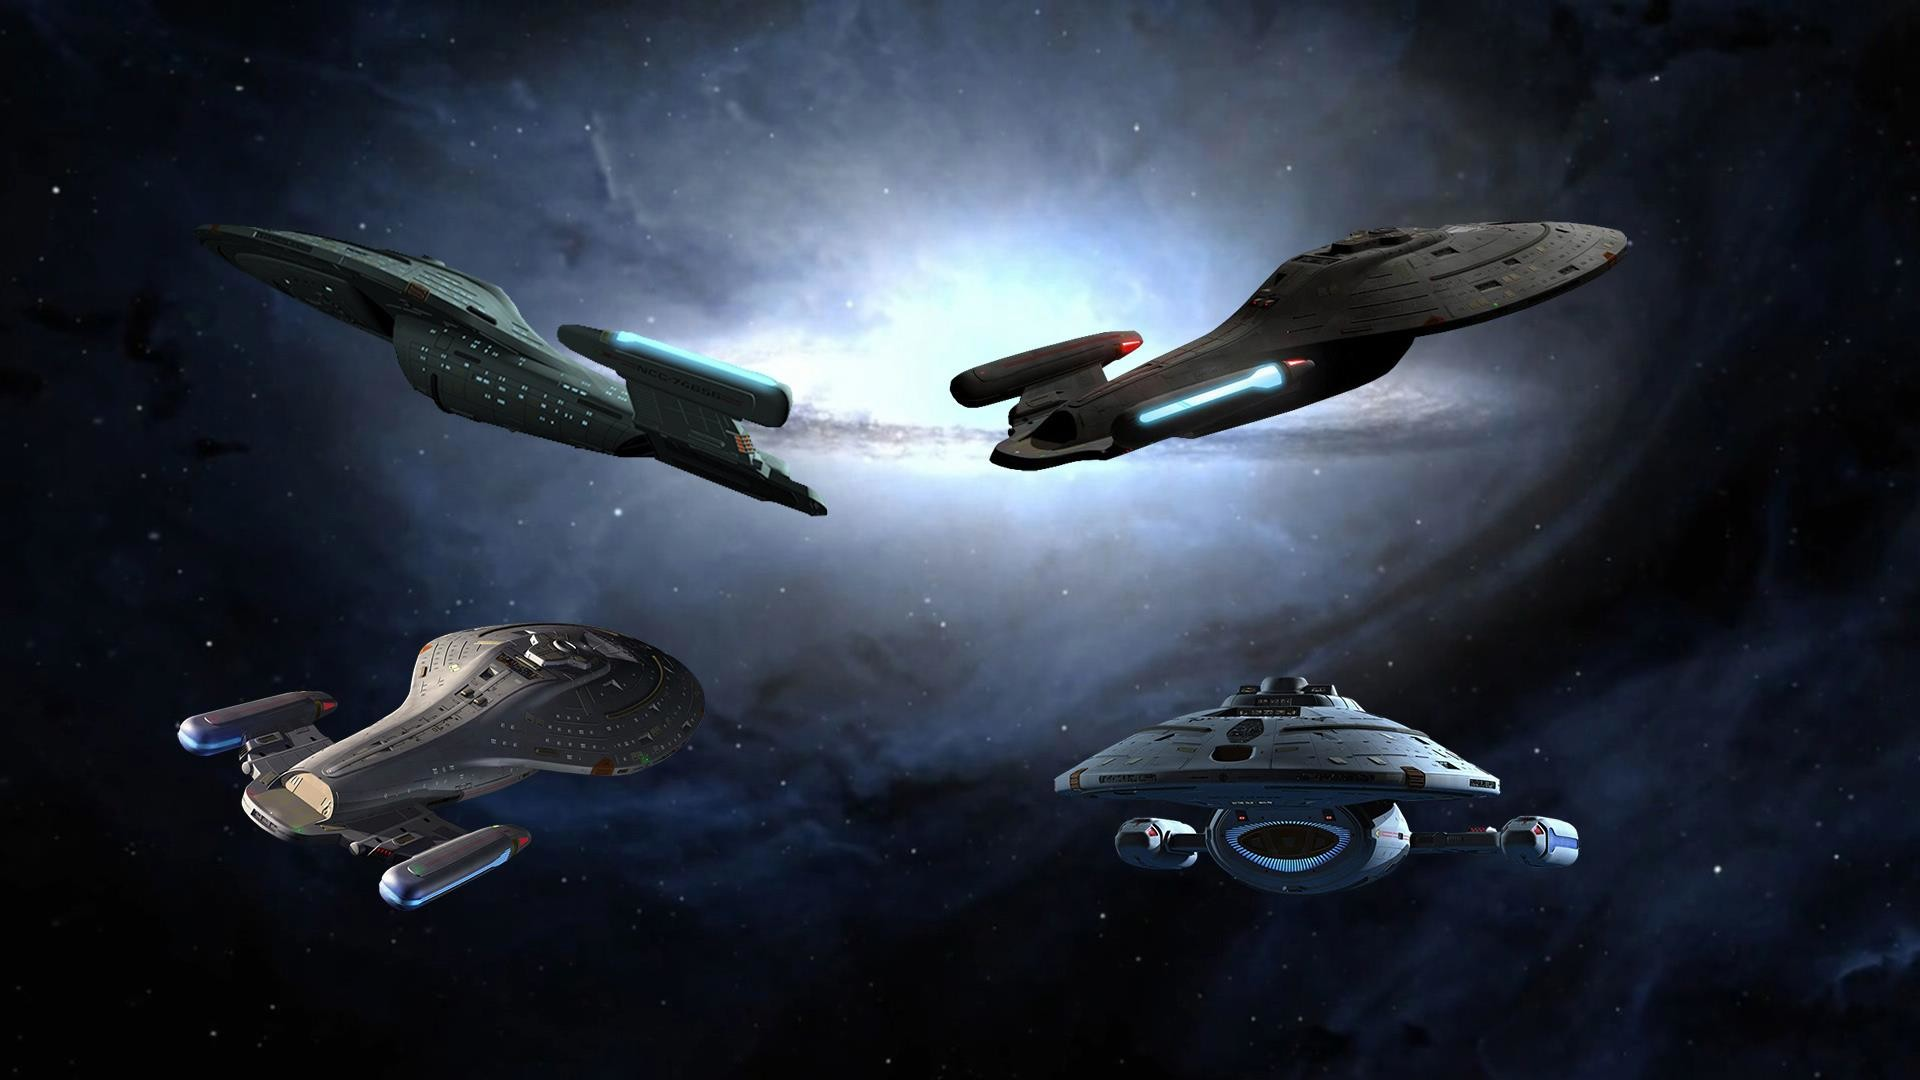 Star Trek Voyager Wallpaper 72 Images